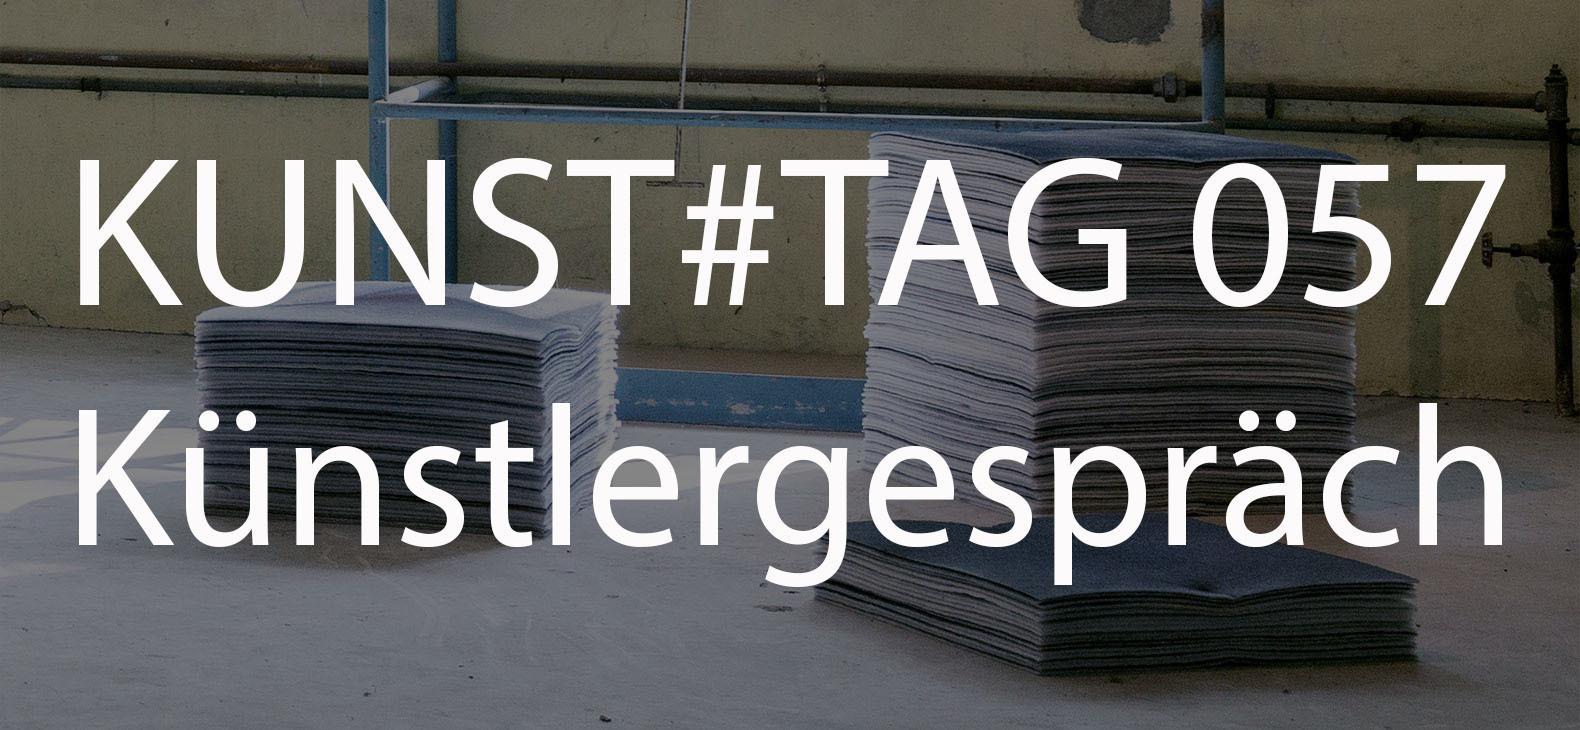 KUNST#TAG 057 Künstlergespräch